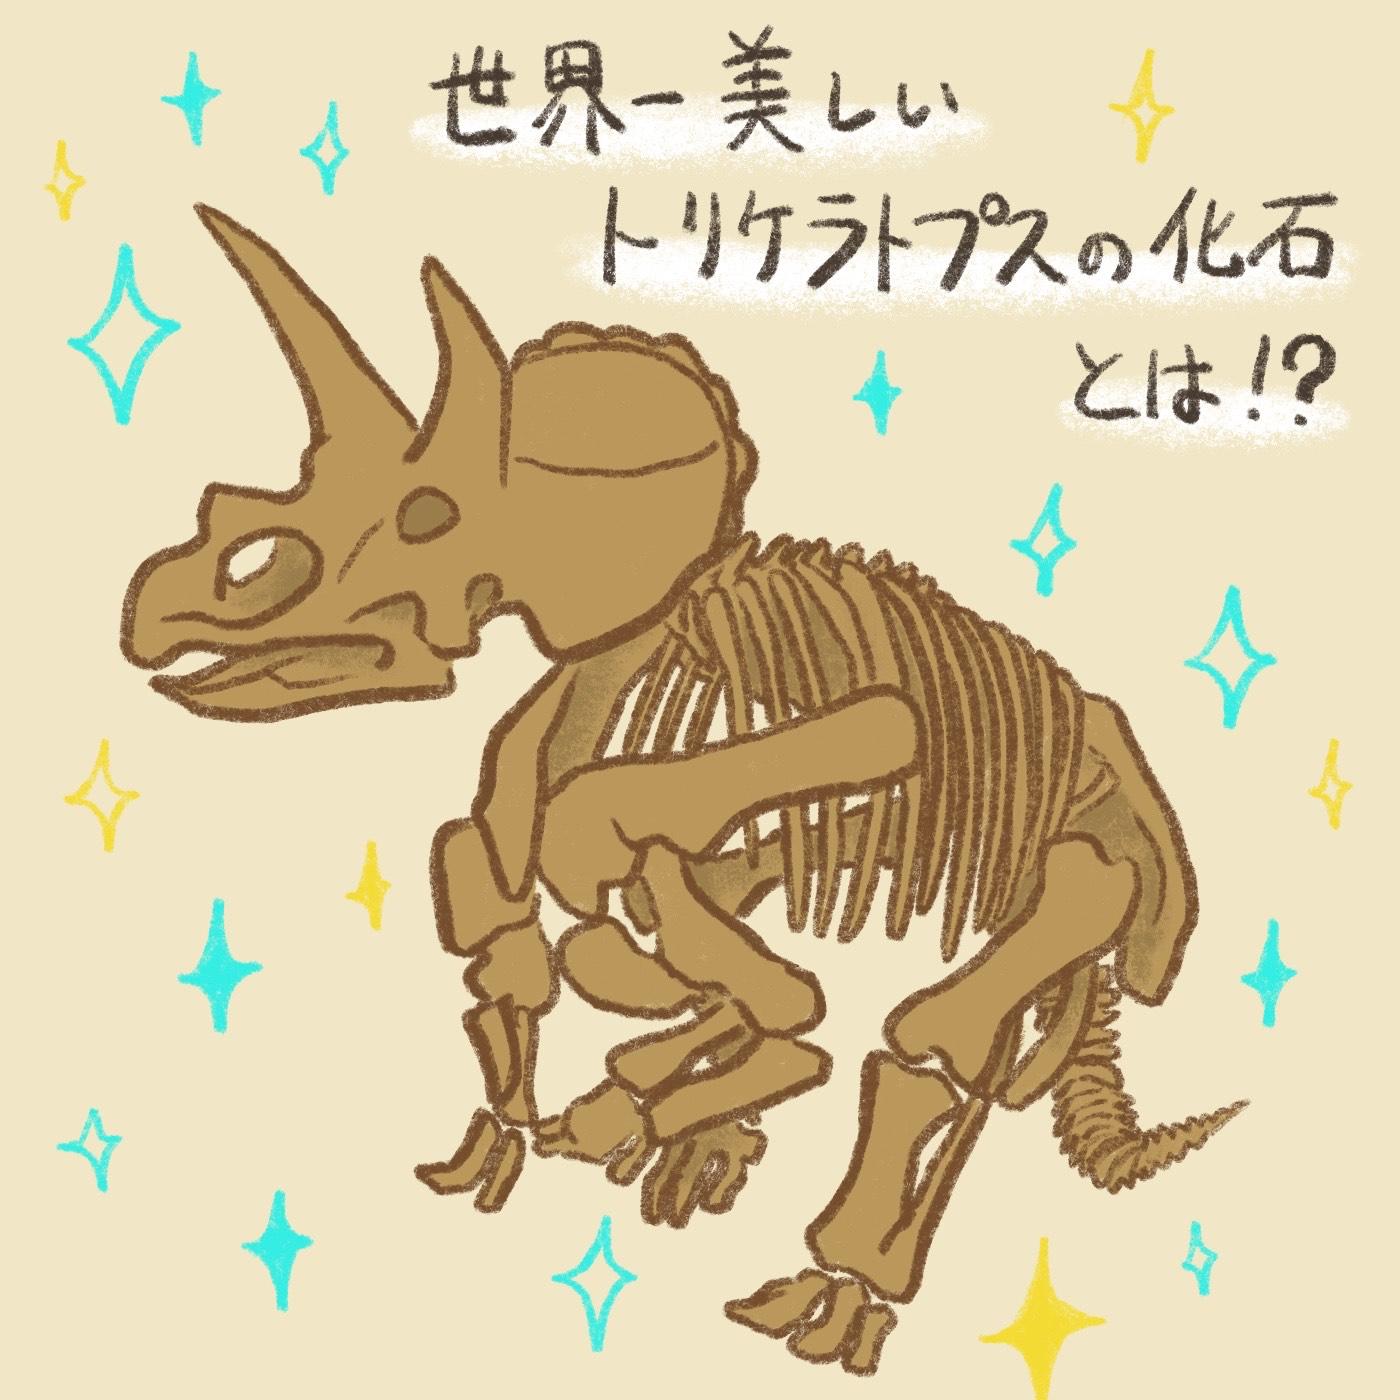 OBIKAKE ナニソレ トリケラトプスの化石 レイン つちやさや